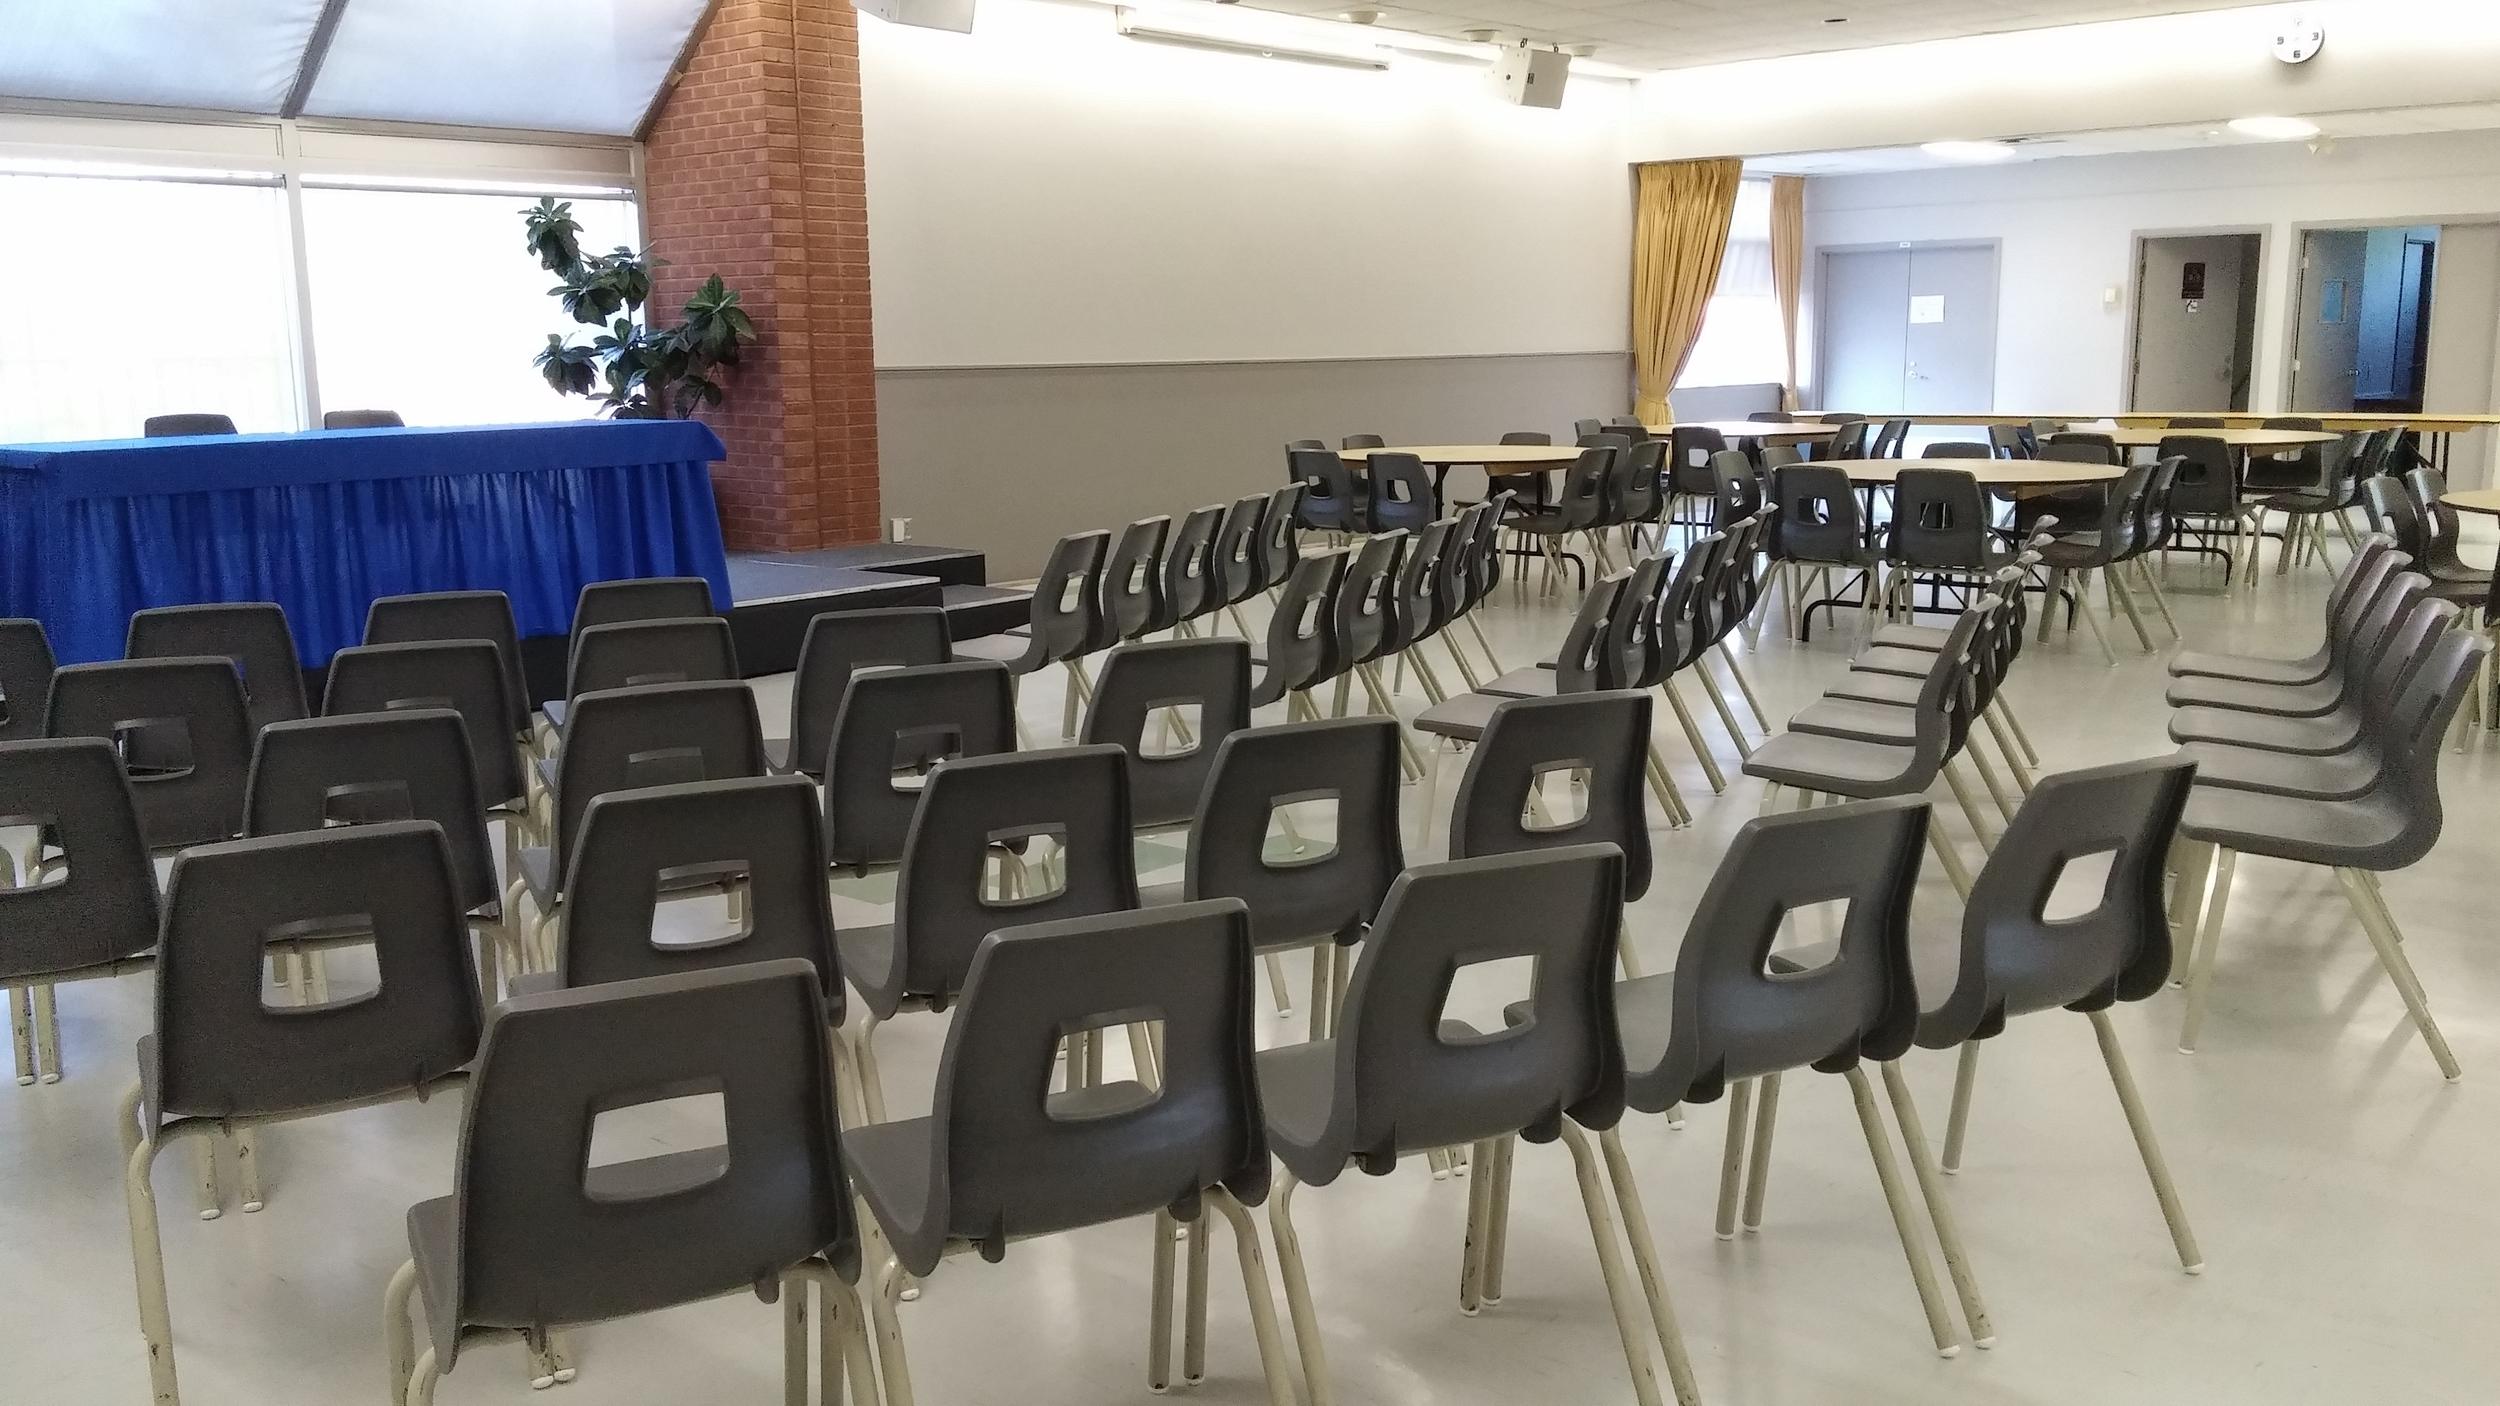 Salle Paul-Lapostolle 2/3 - funérailles